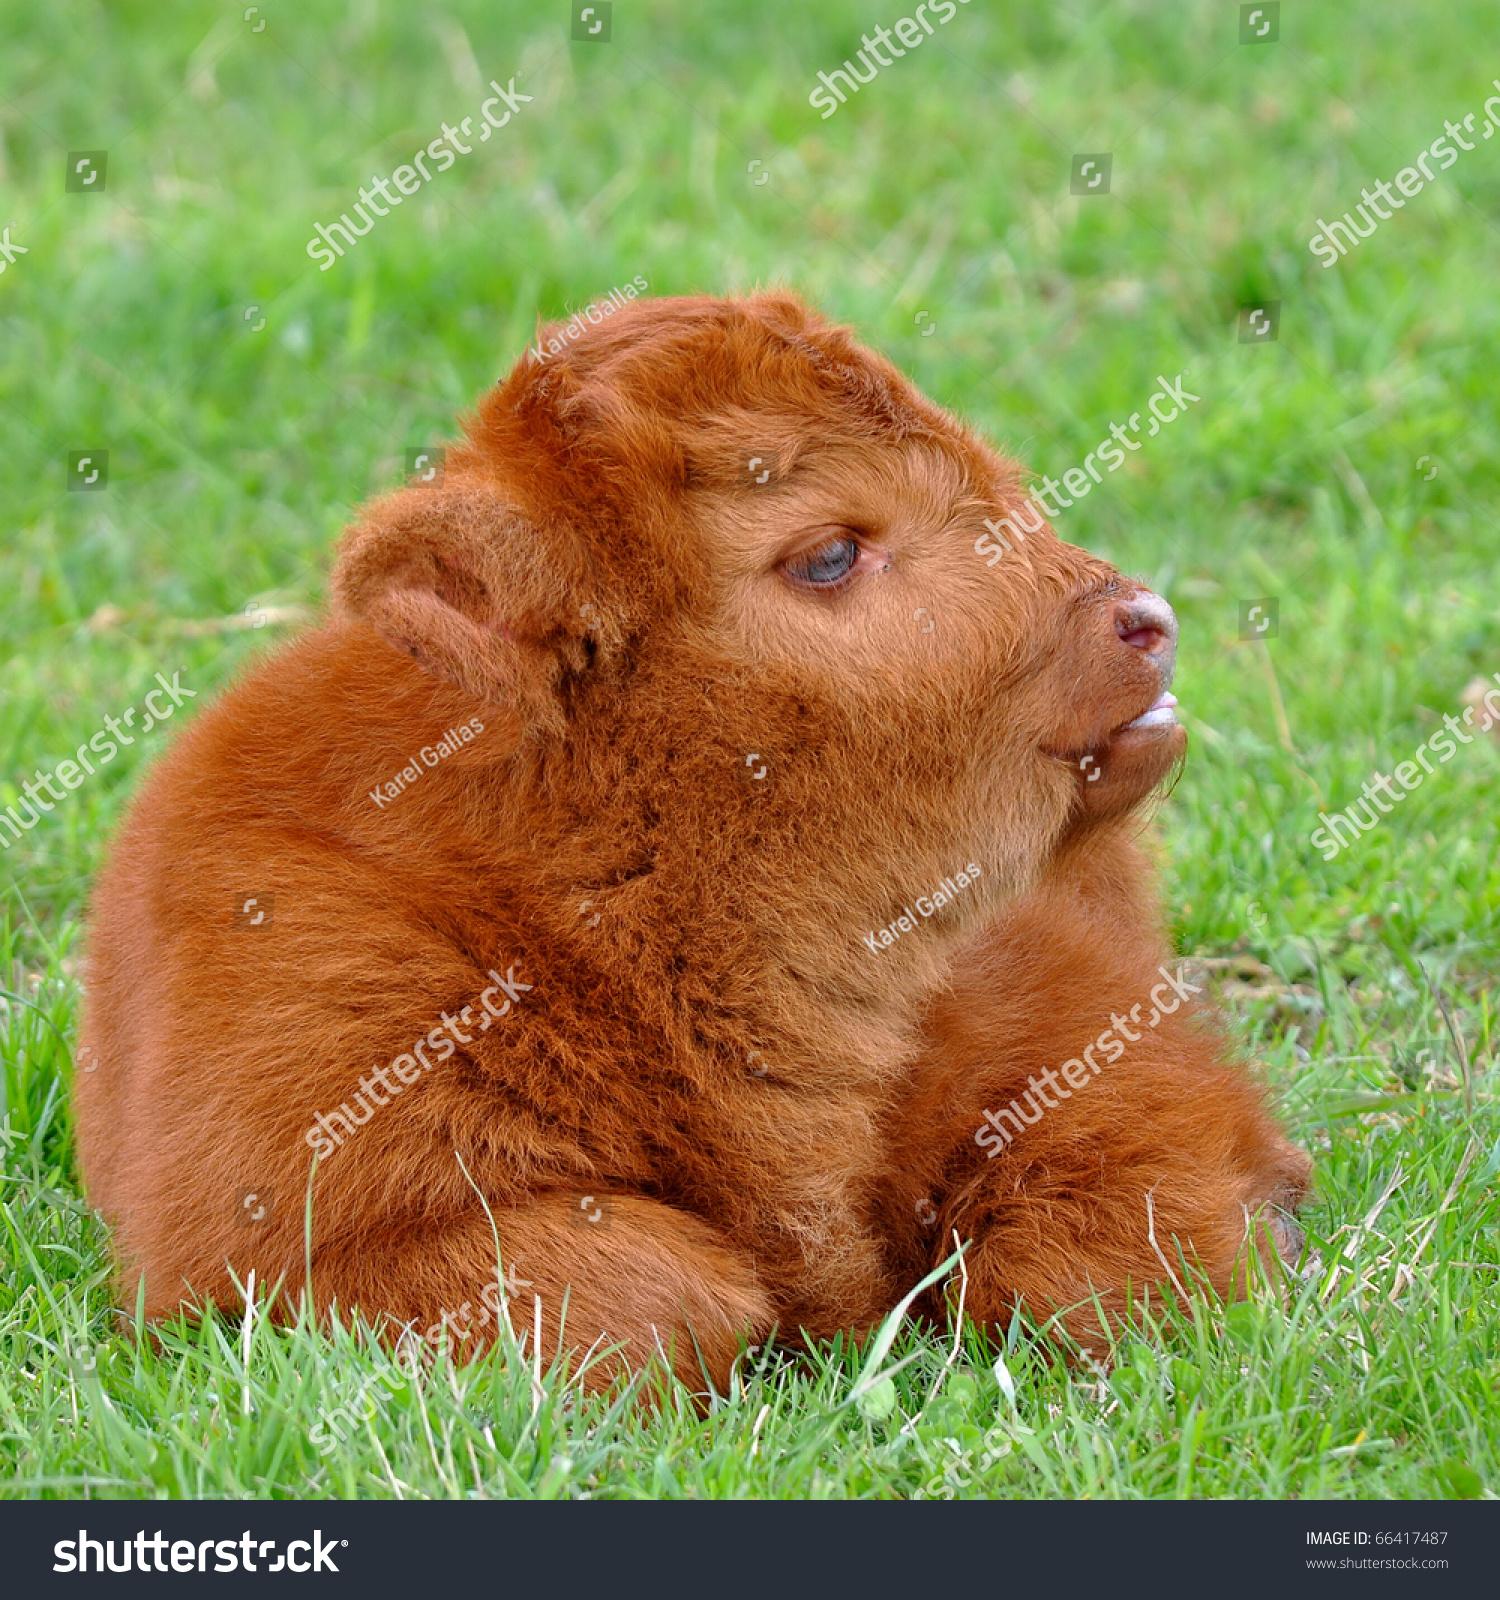 Stock Photo Cute Calf